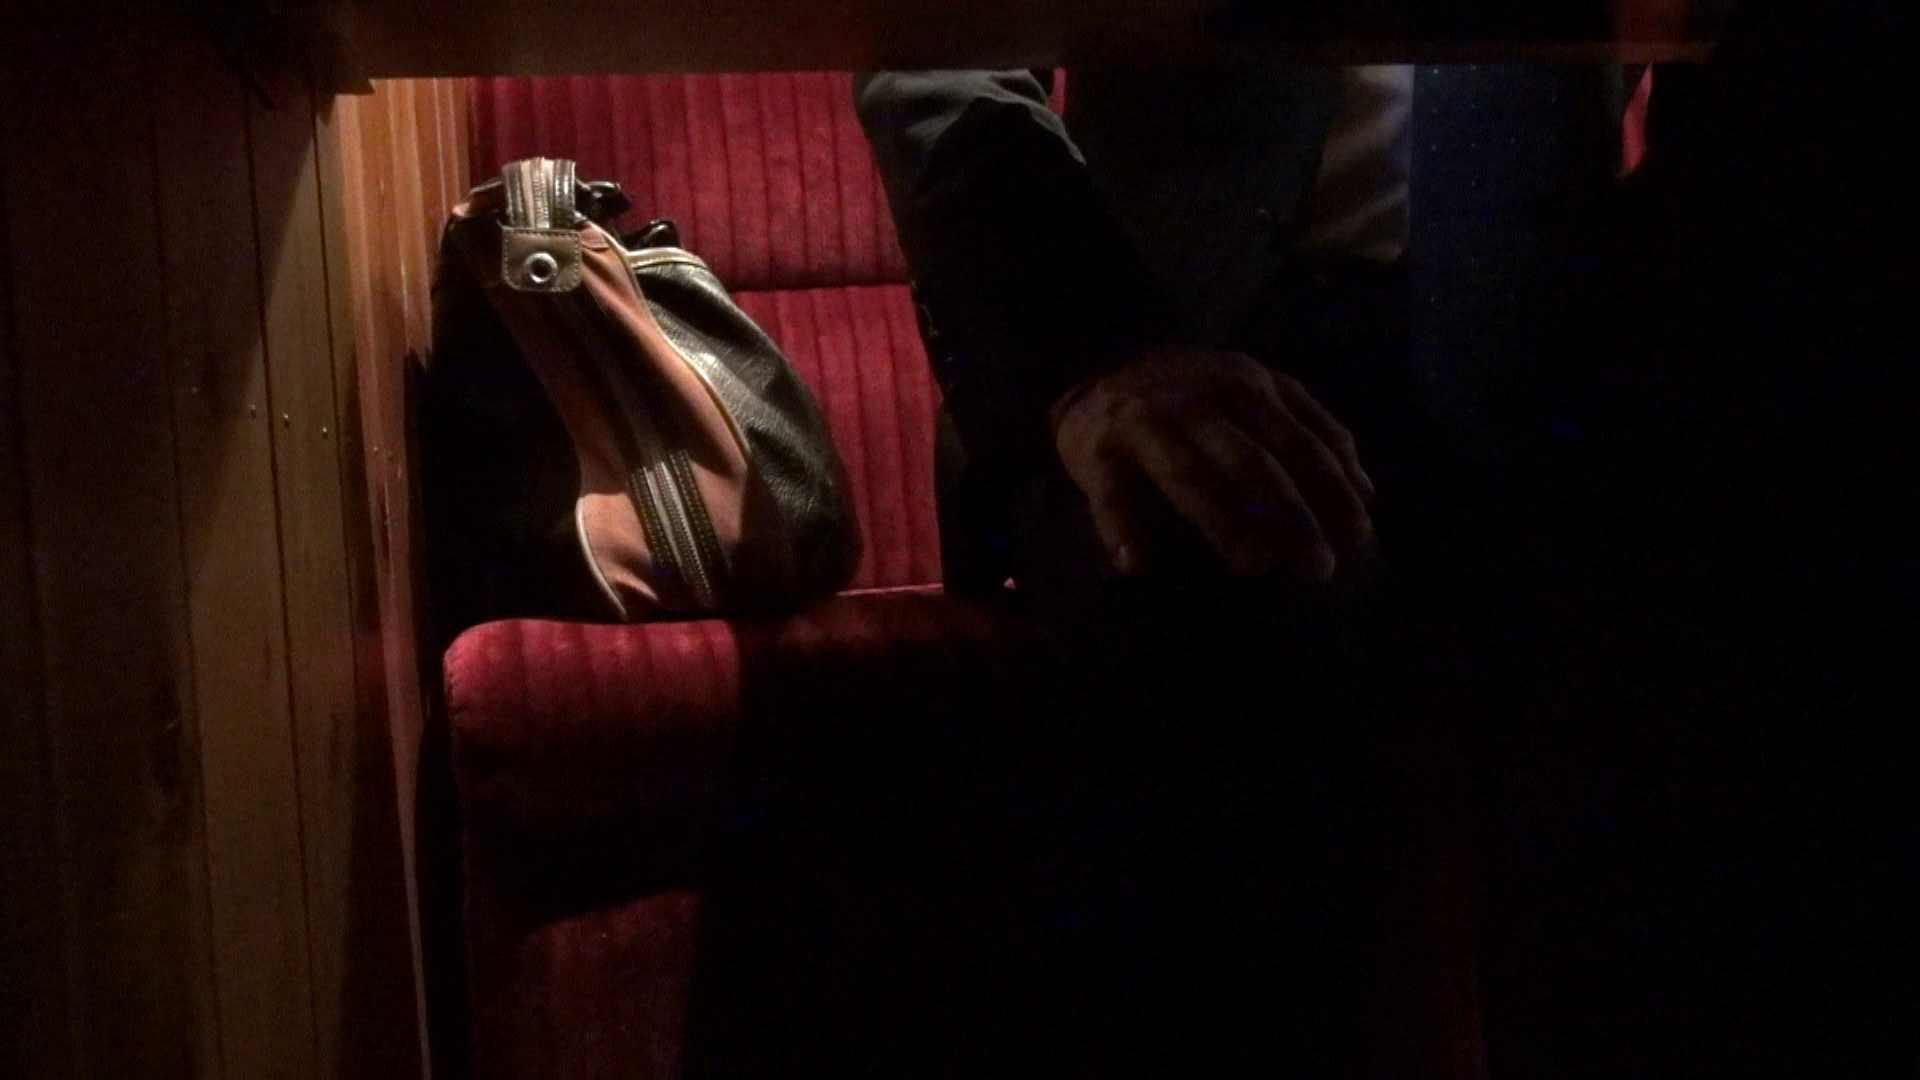 episode1 ヒロトさんと保険外交員との顔合わせ 盗撮 エロ無料画像 71pic 12